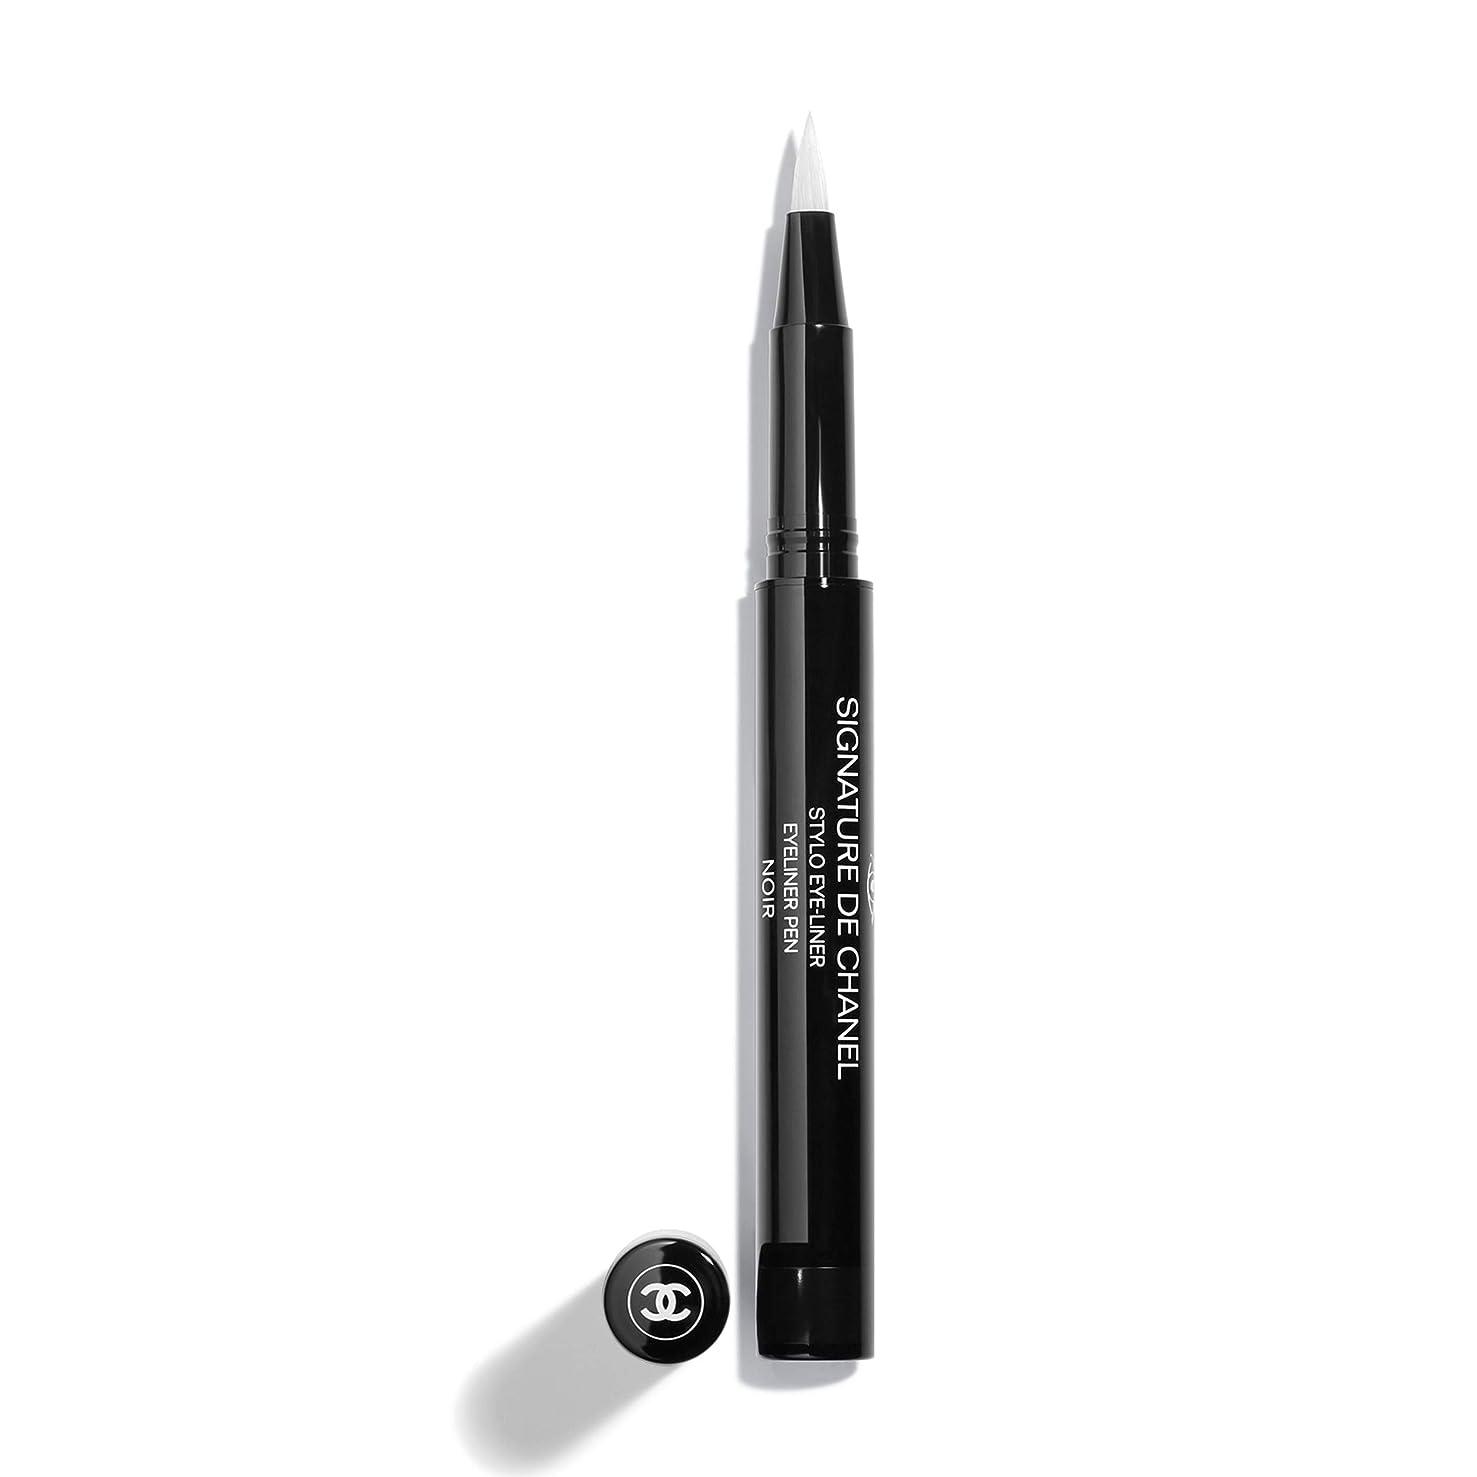 SIGNATURE DE CHANEL Intense Longwear Eyeliner Pen Color: 10 Noir